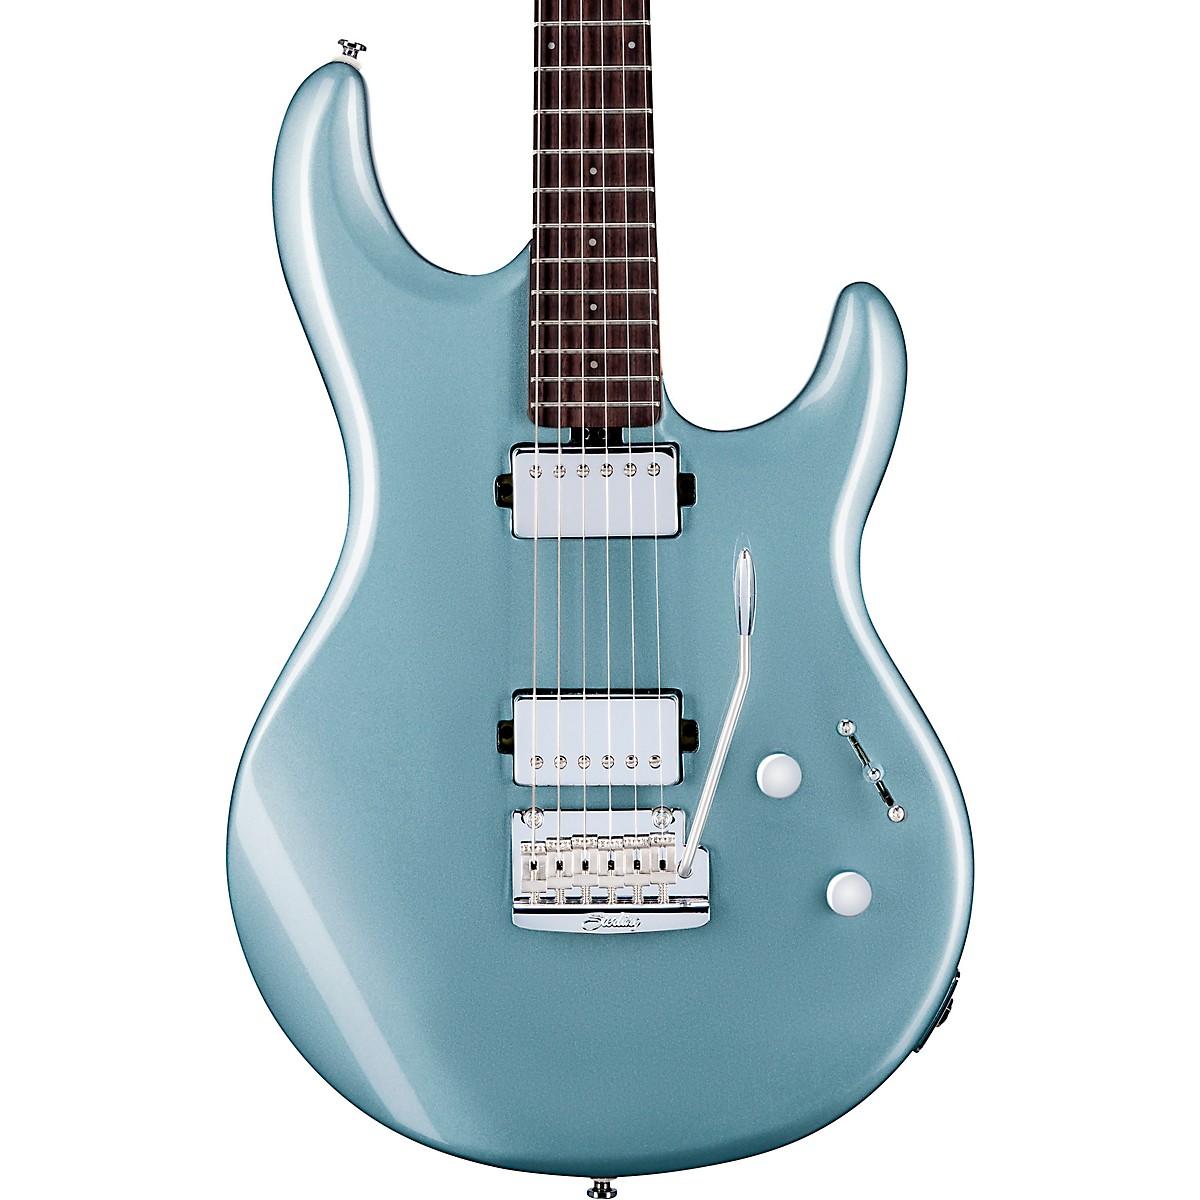 Sterling by Music Man Luke Electric Guitar